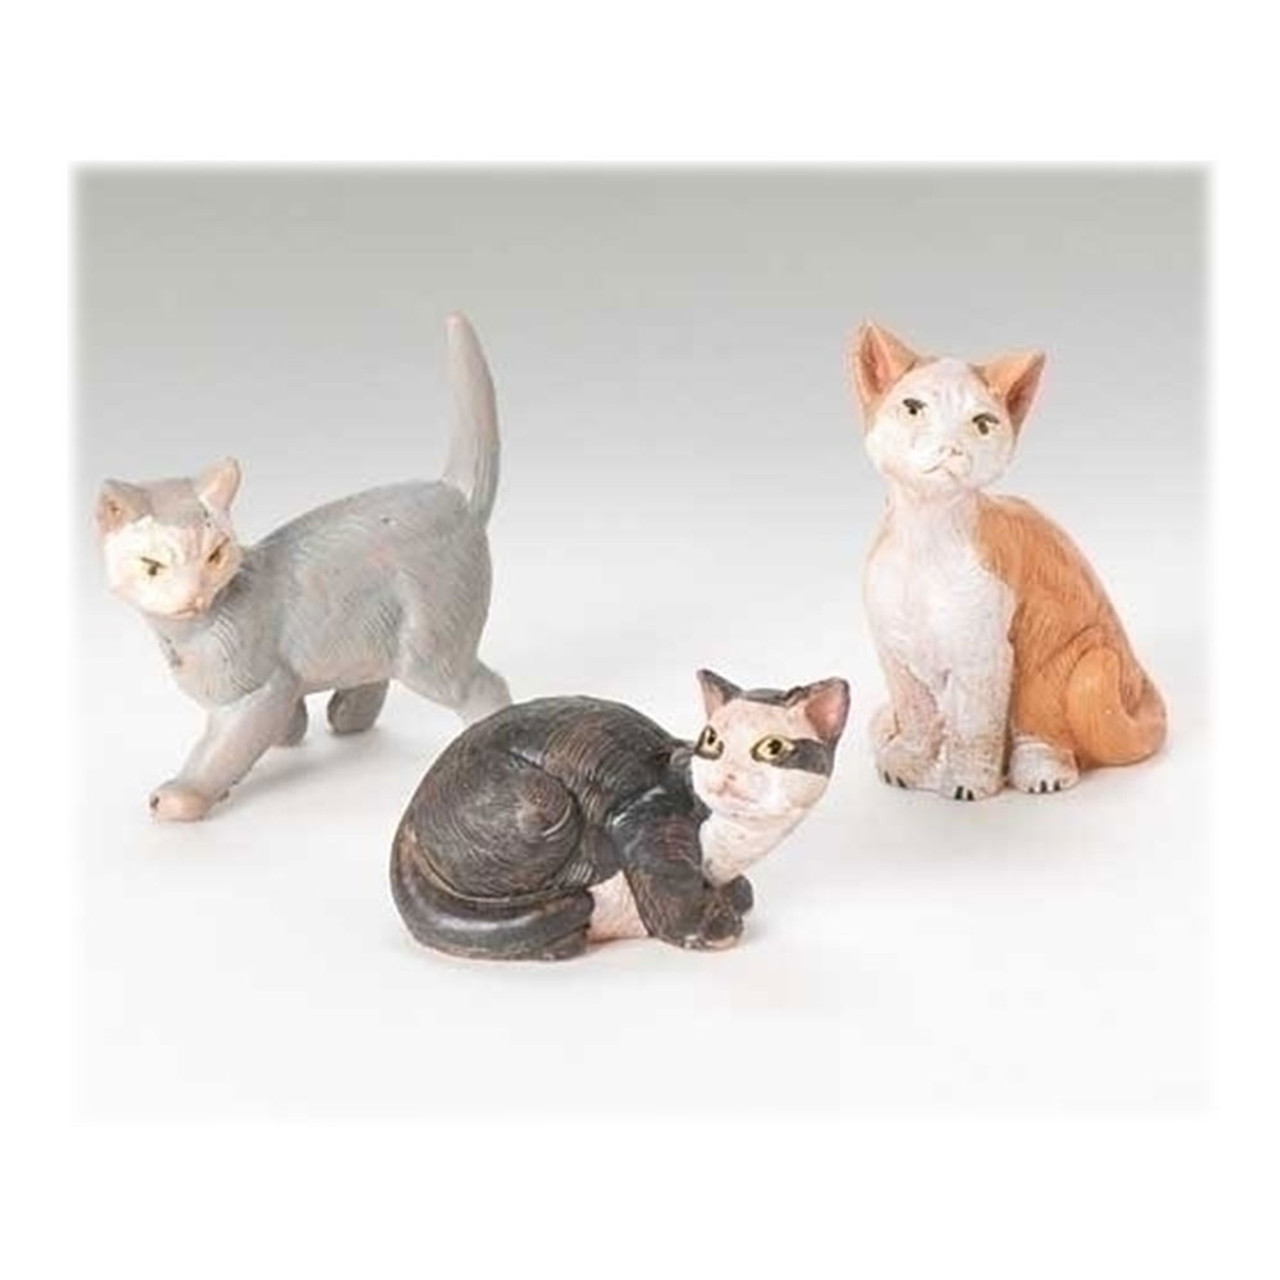 3-Piece Fontanini Nativity Cat Set w/Story Card